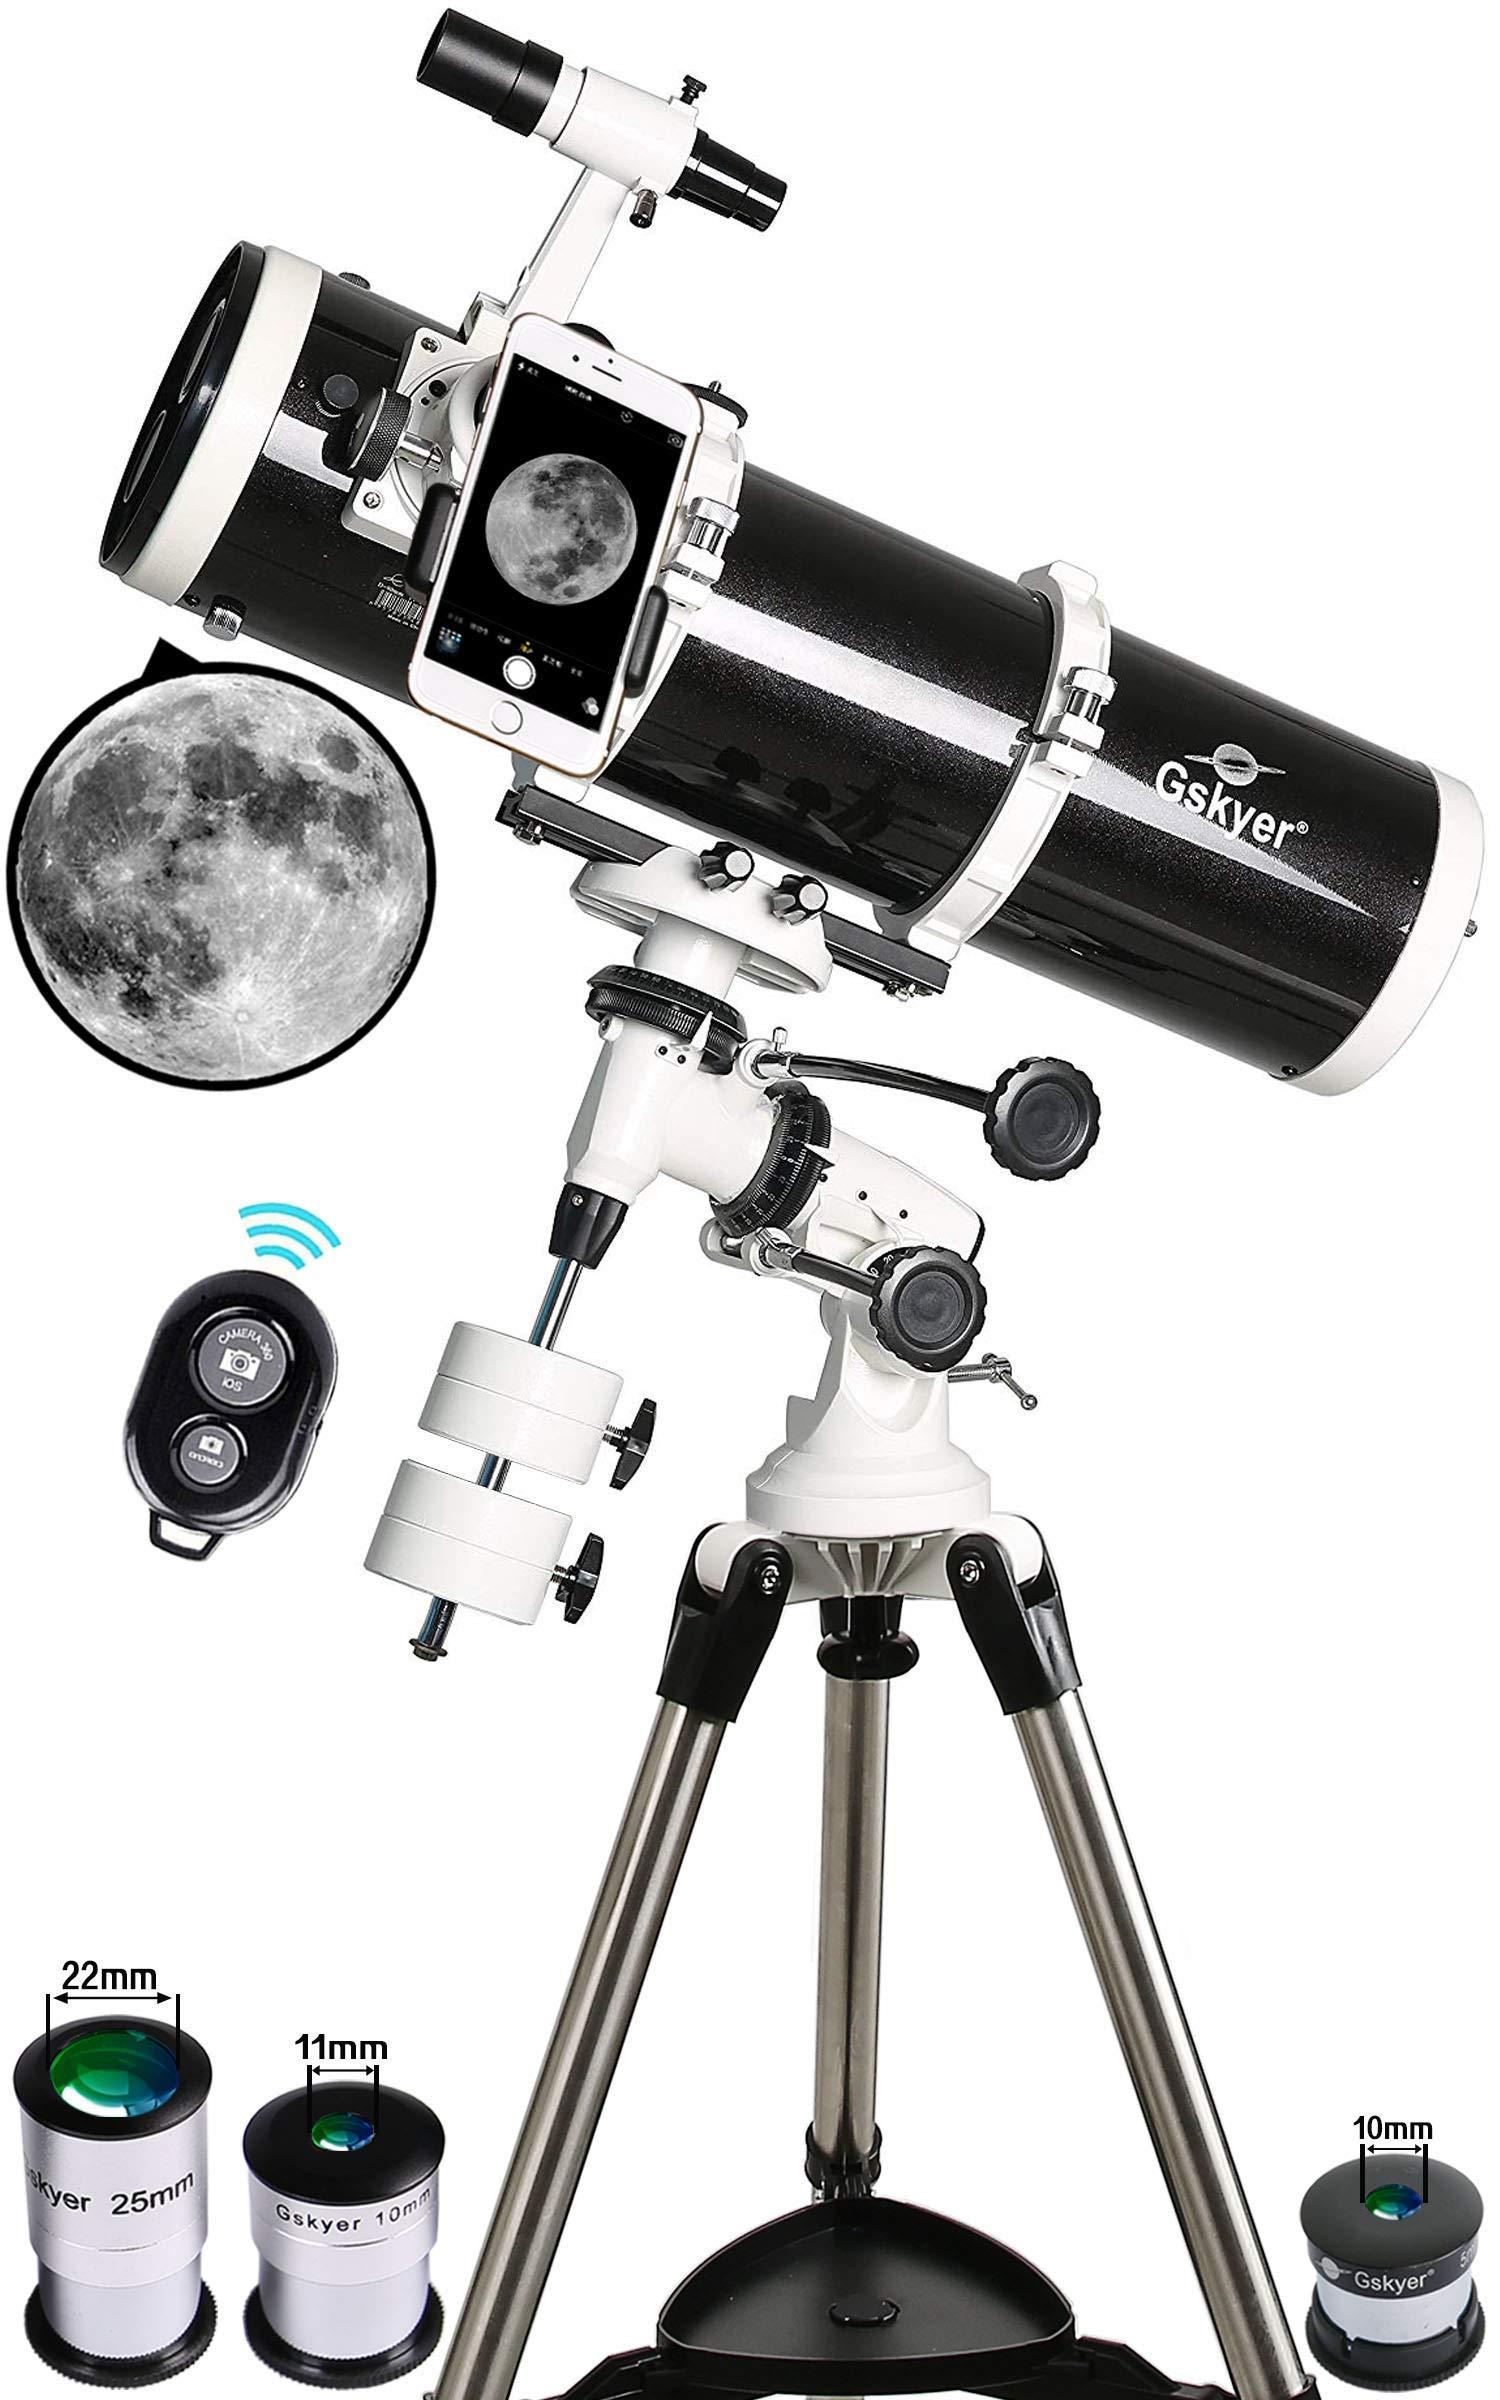 Gskyer Telescope, 130EQ Professional Astronomical Reflector Telescope, German Technology Scope (Renewed) by Gskyer